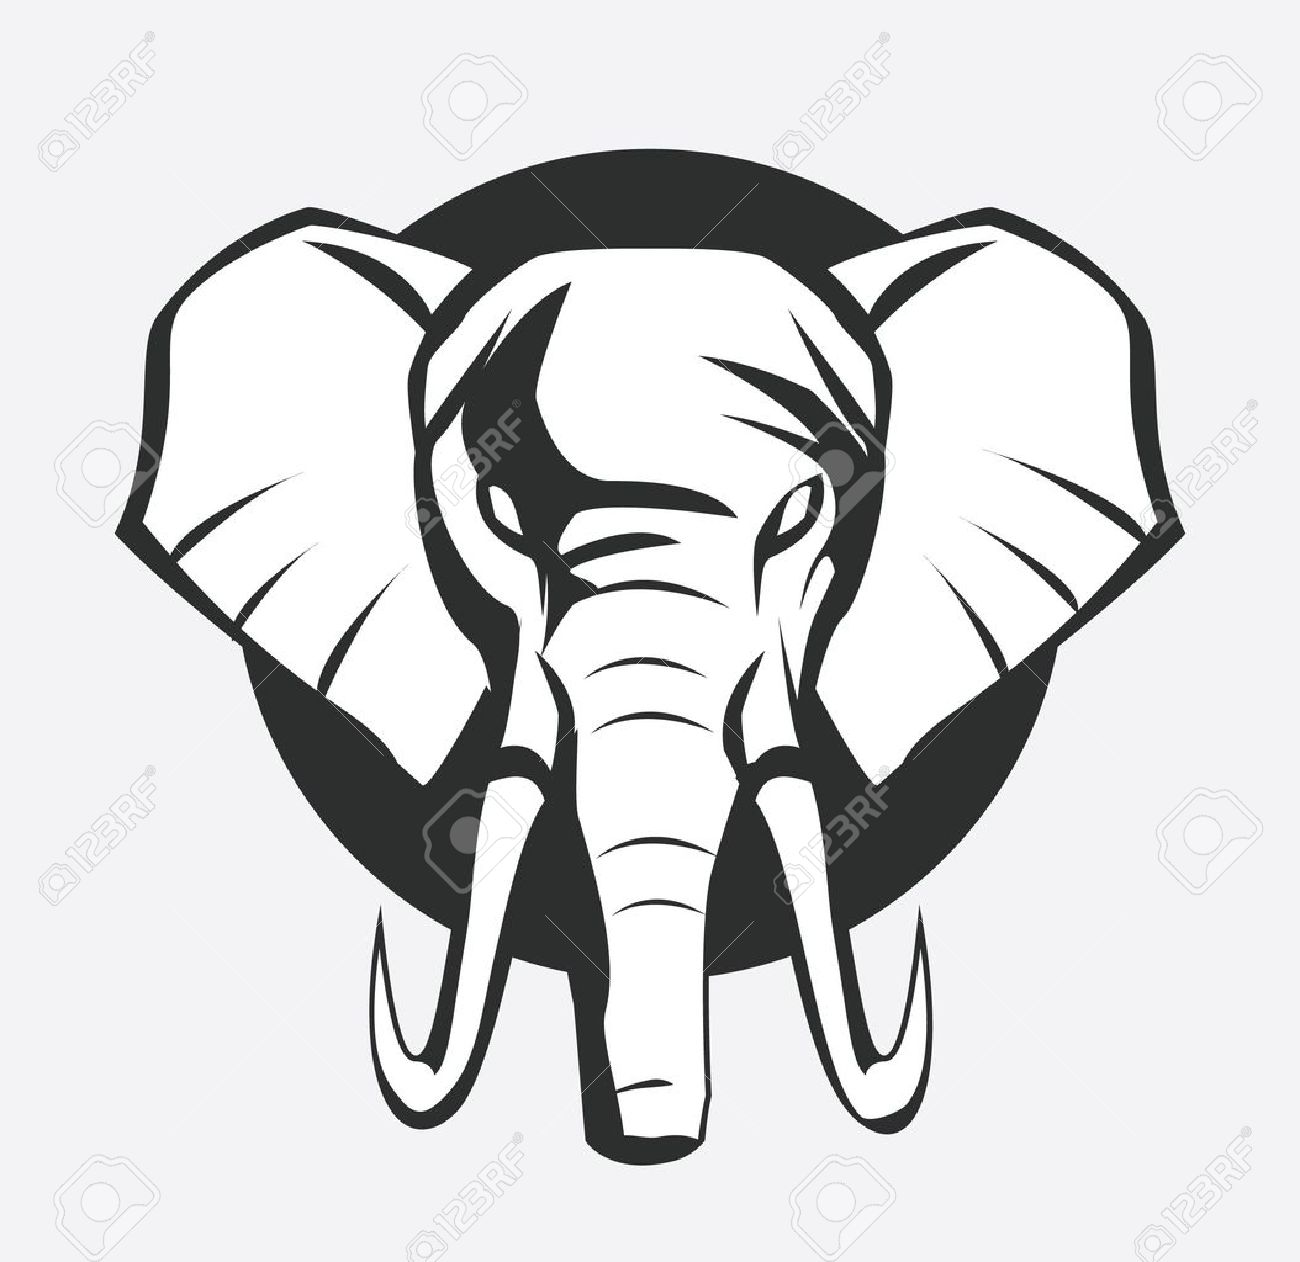 Elephant symbol royalty free cliparts vectors and stock elephant symbol stock vector 17444872 buycottarizona Images